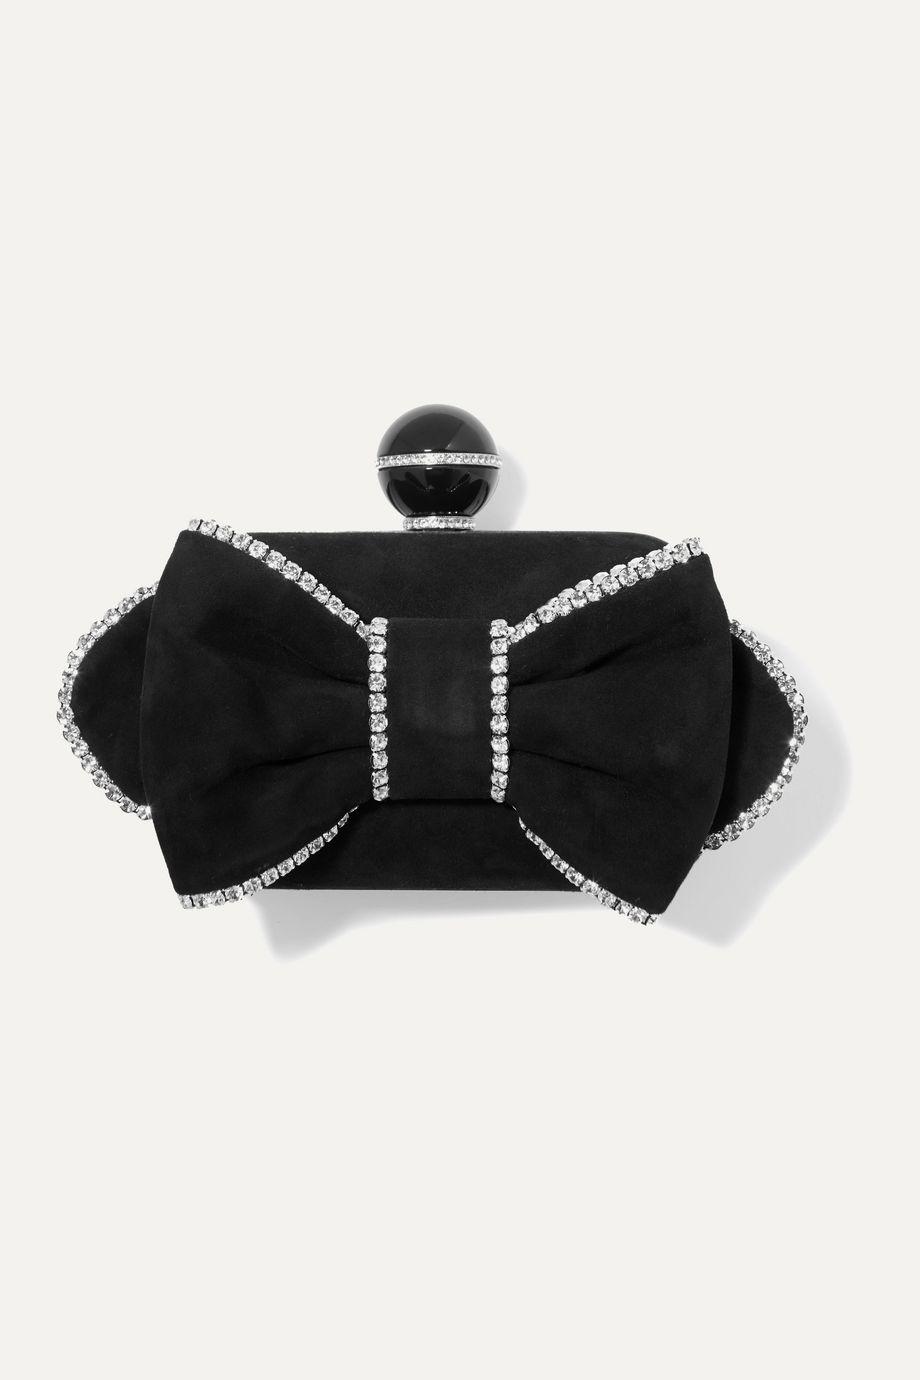 Jimmy Choo Cloud crystal-embellished suede clutch